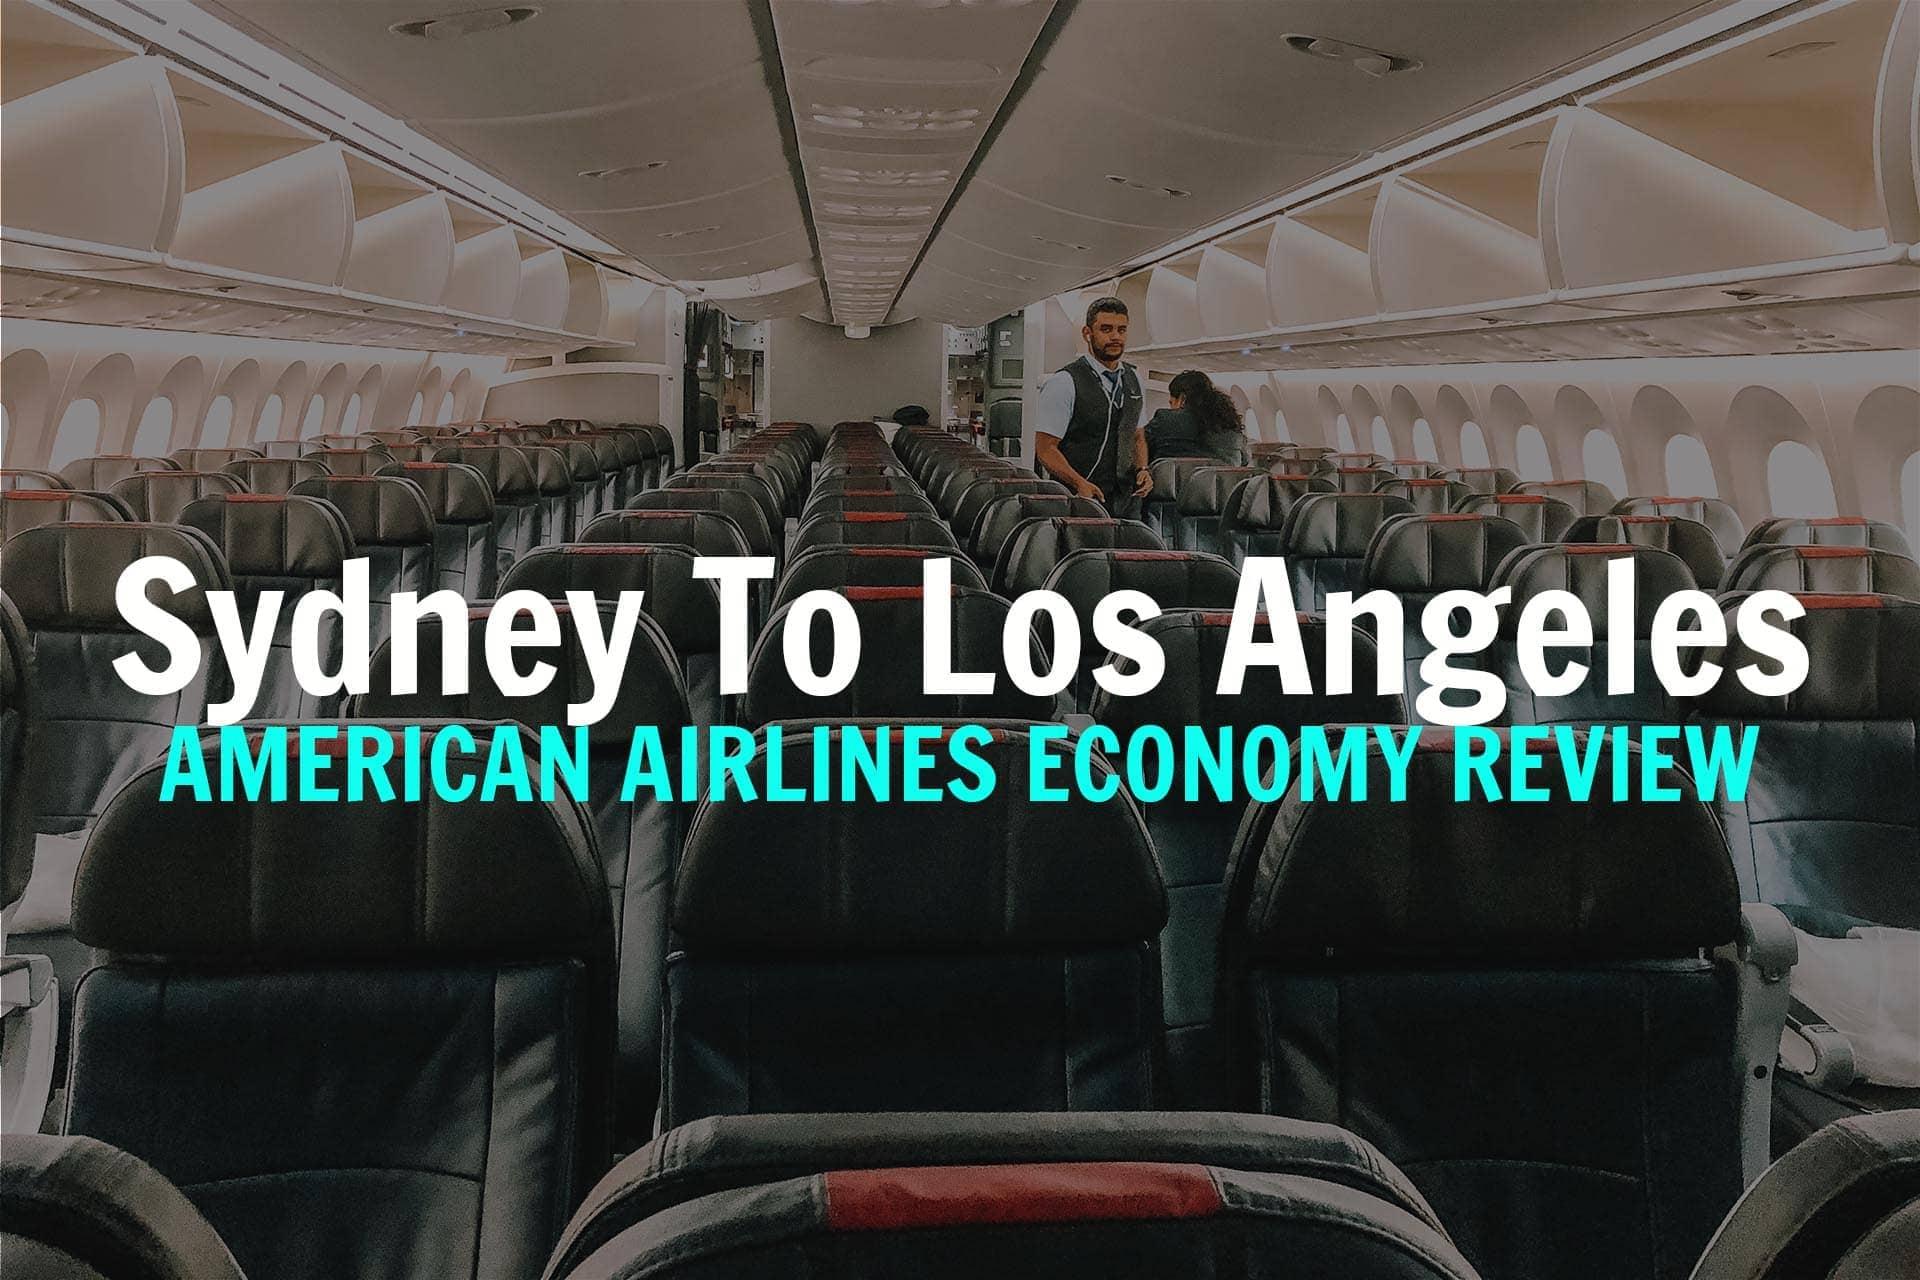 SYDNEY-TO-LOS-ANGELES